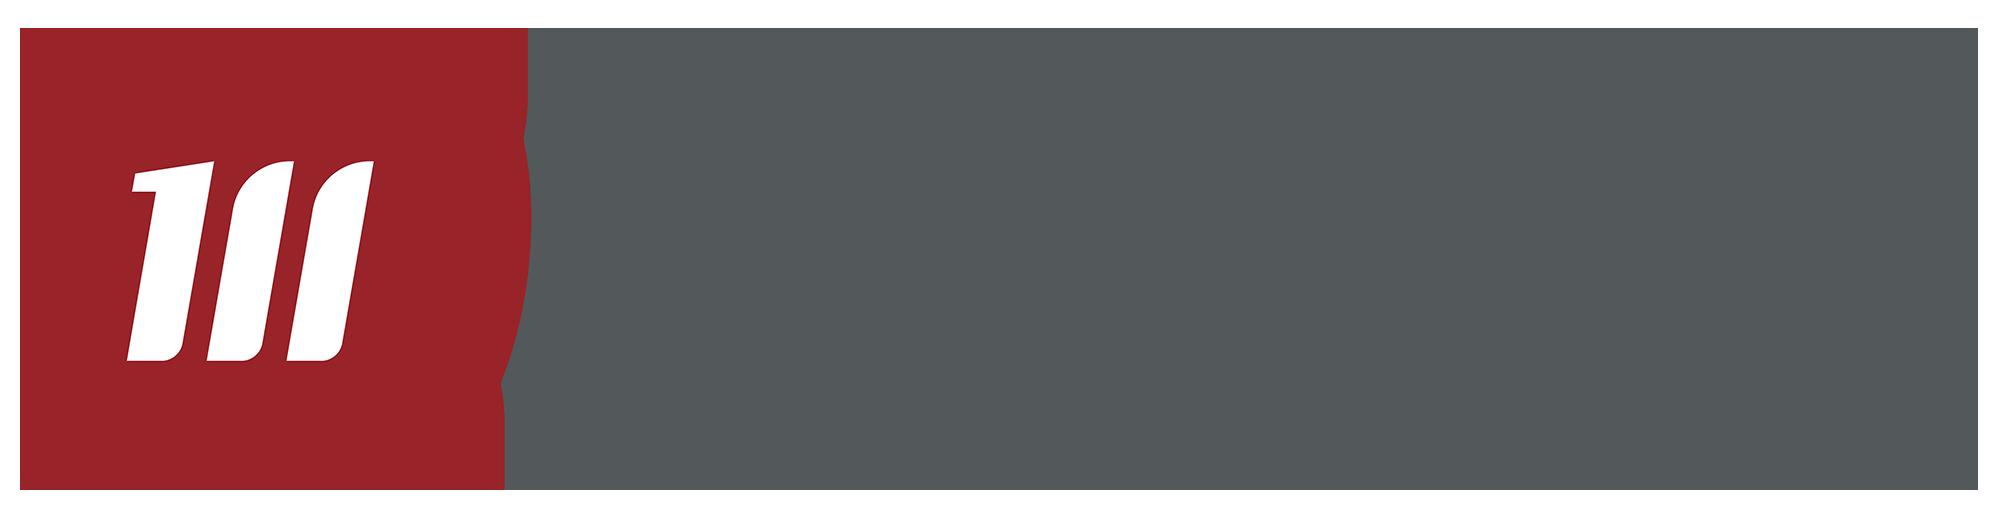 Meet the Med One Team